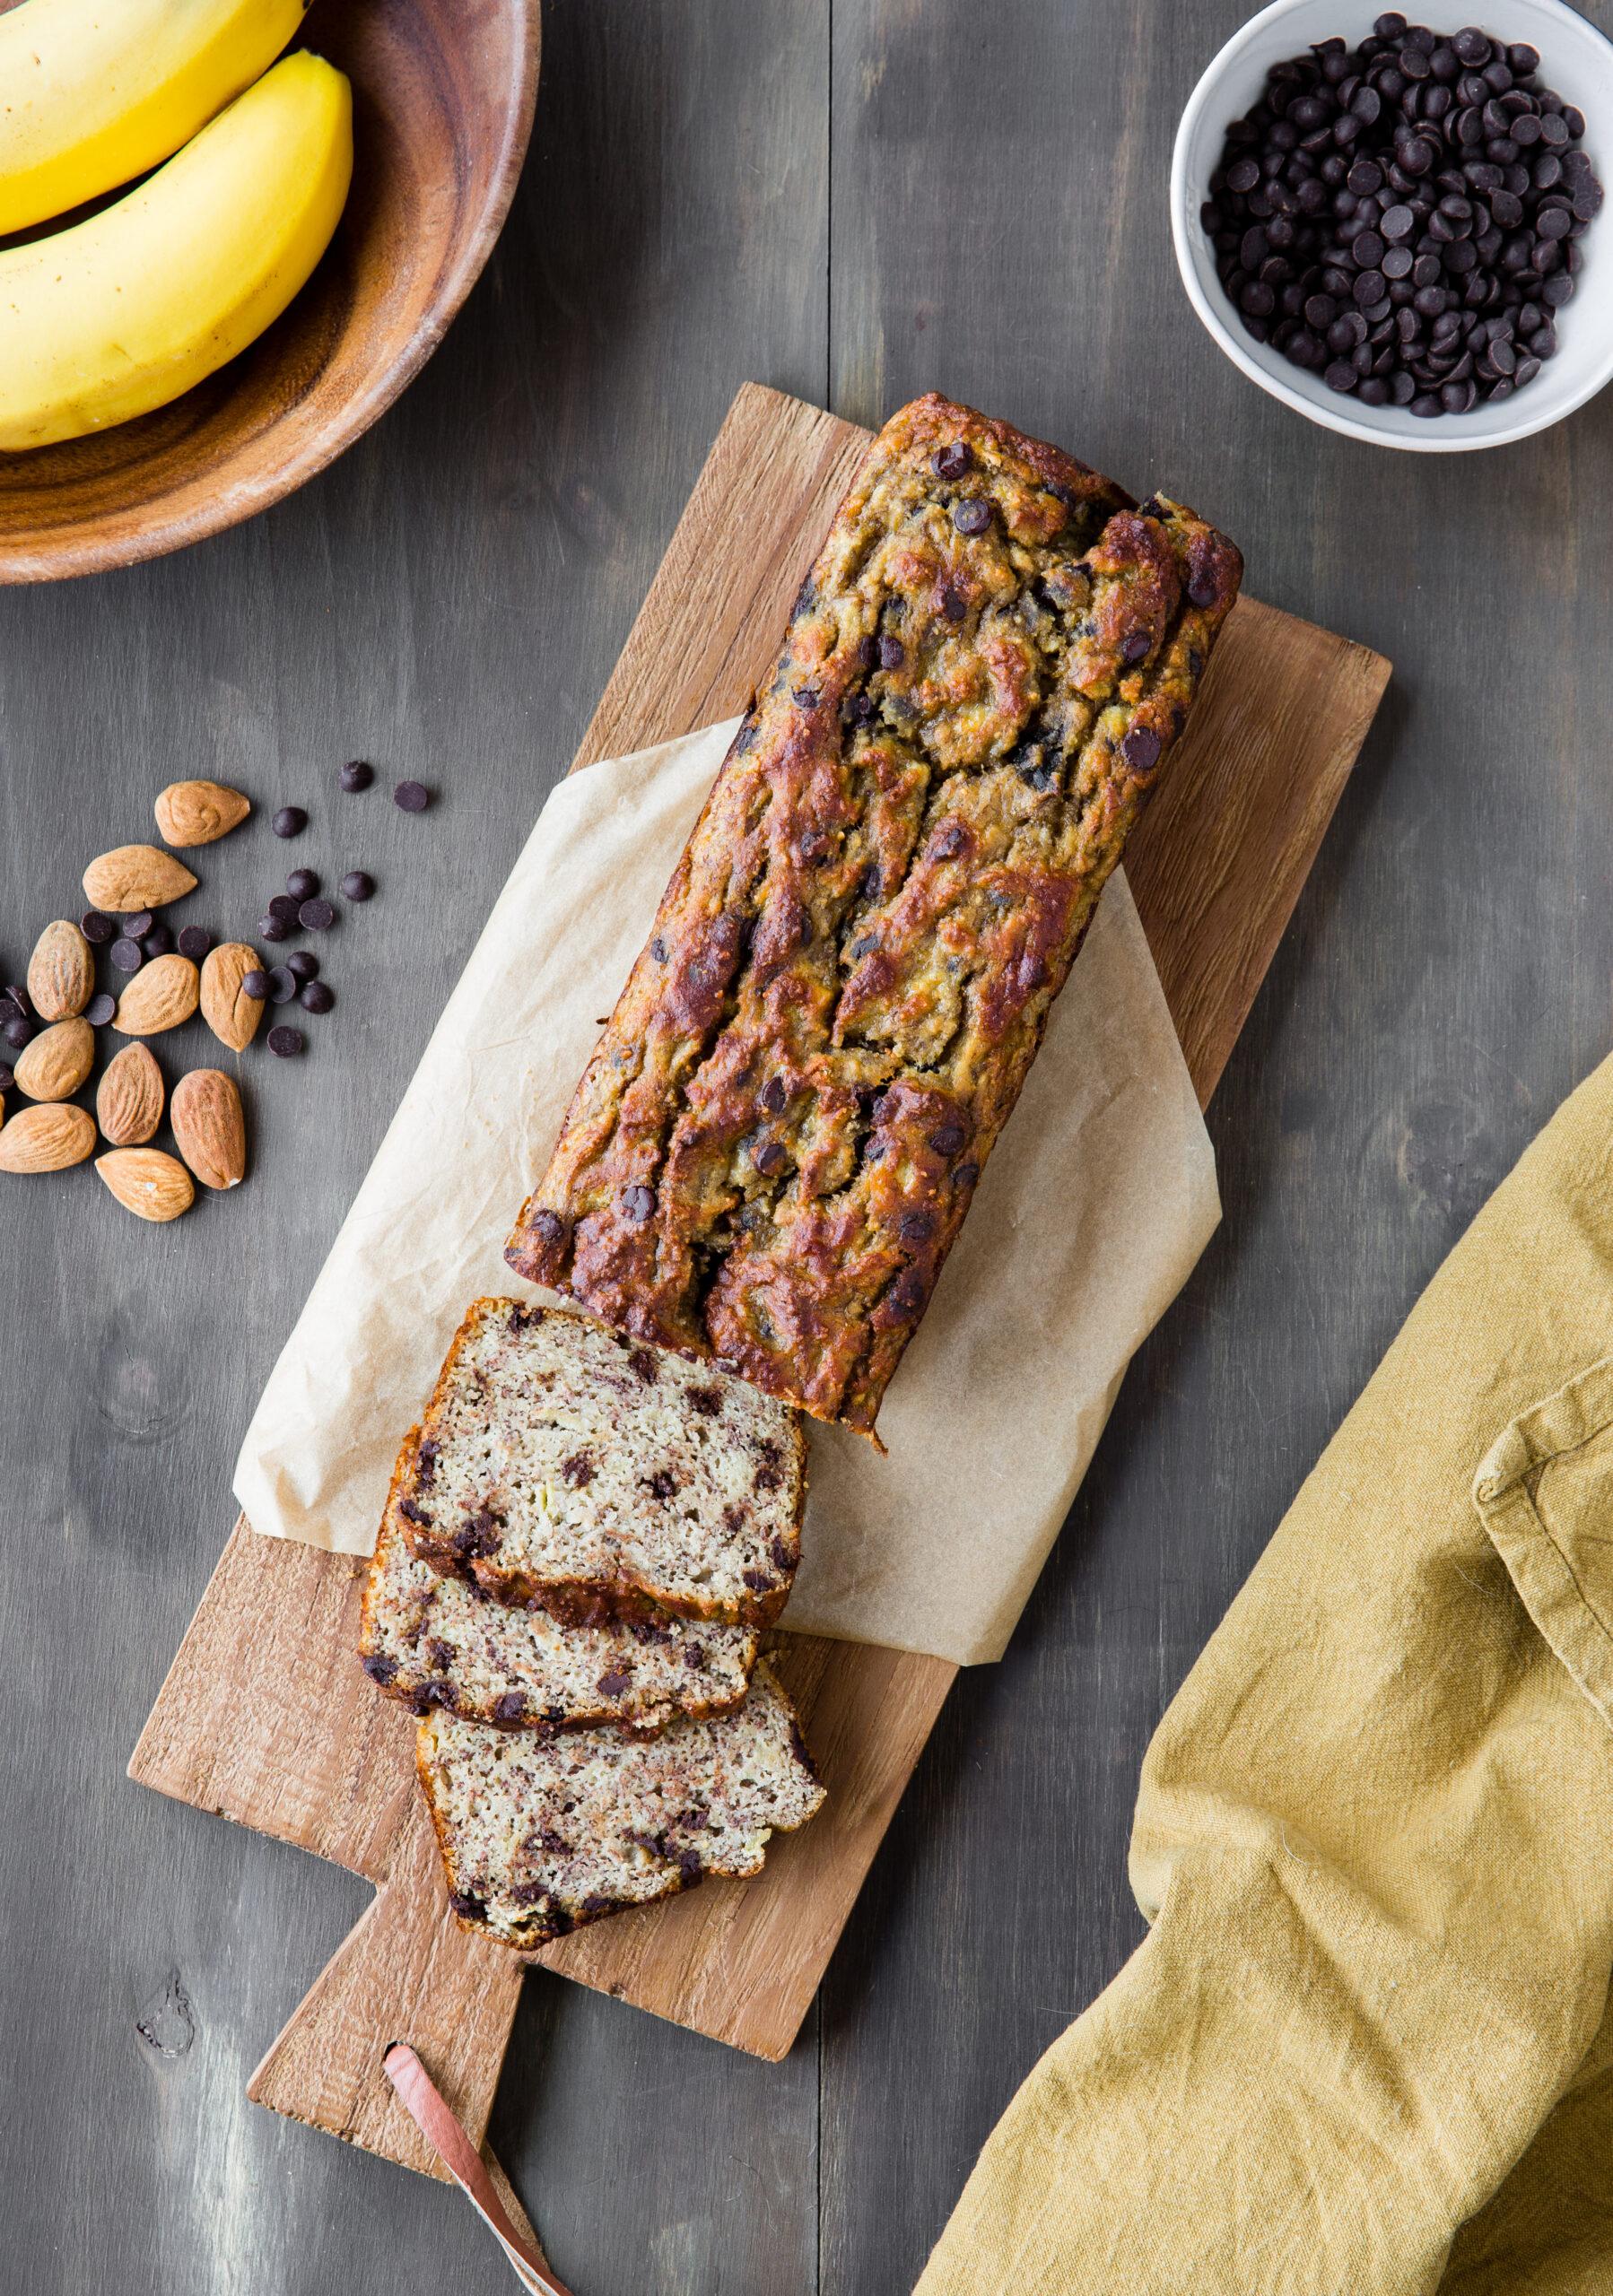 Recette Cuisine Vivante - Banana Bread